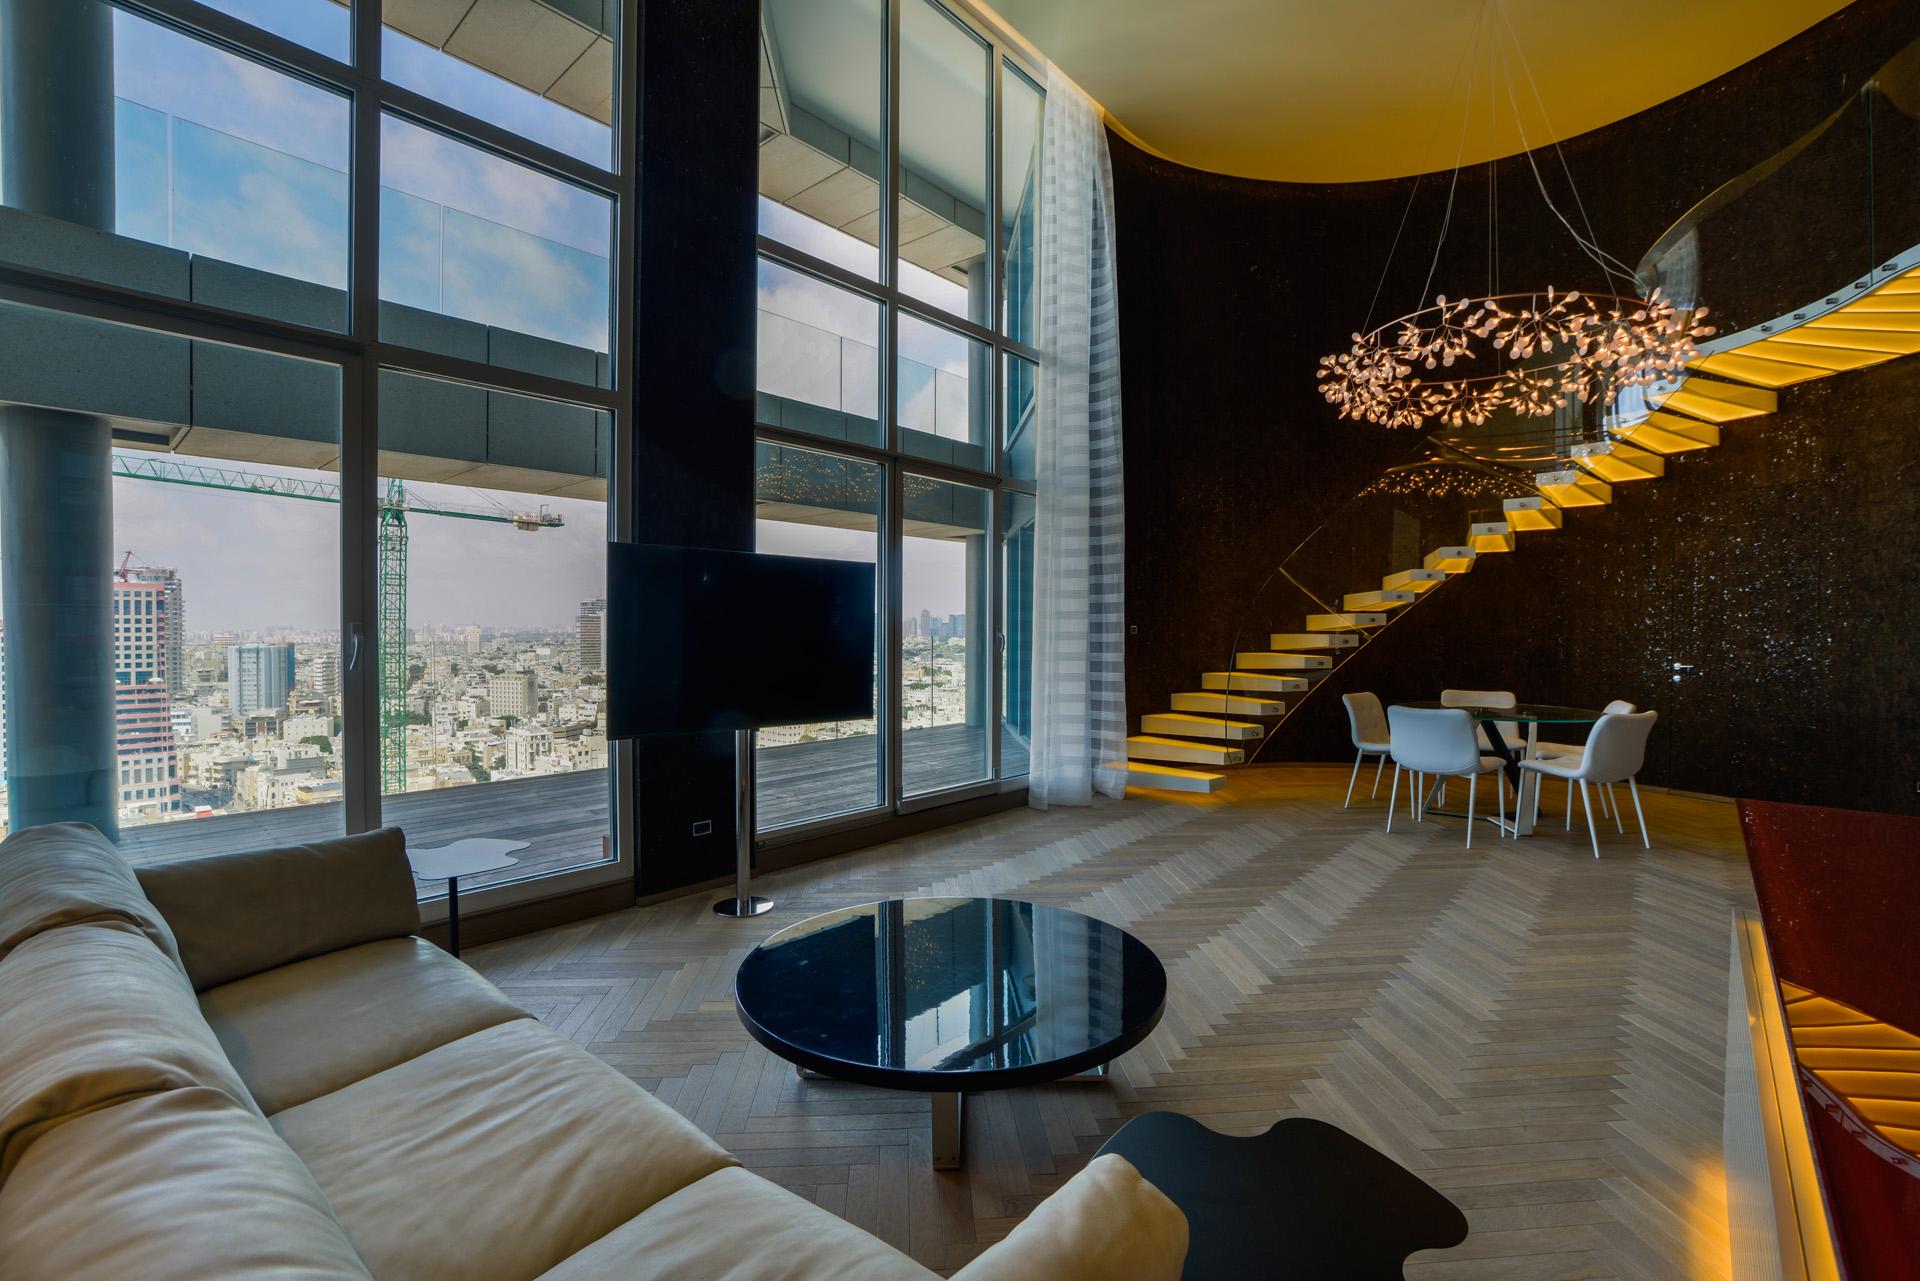 Duplex for Sale at Breathtaking view Duplex at Sea One Tel Aviv, Israel